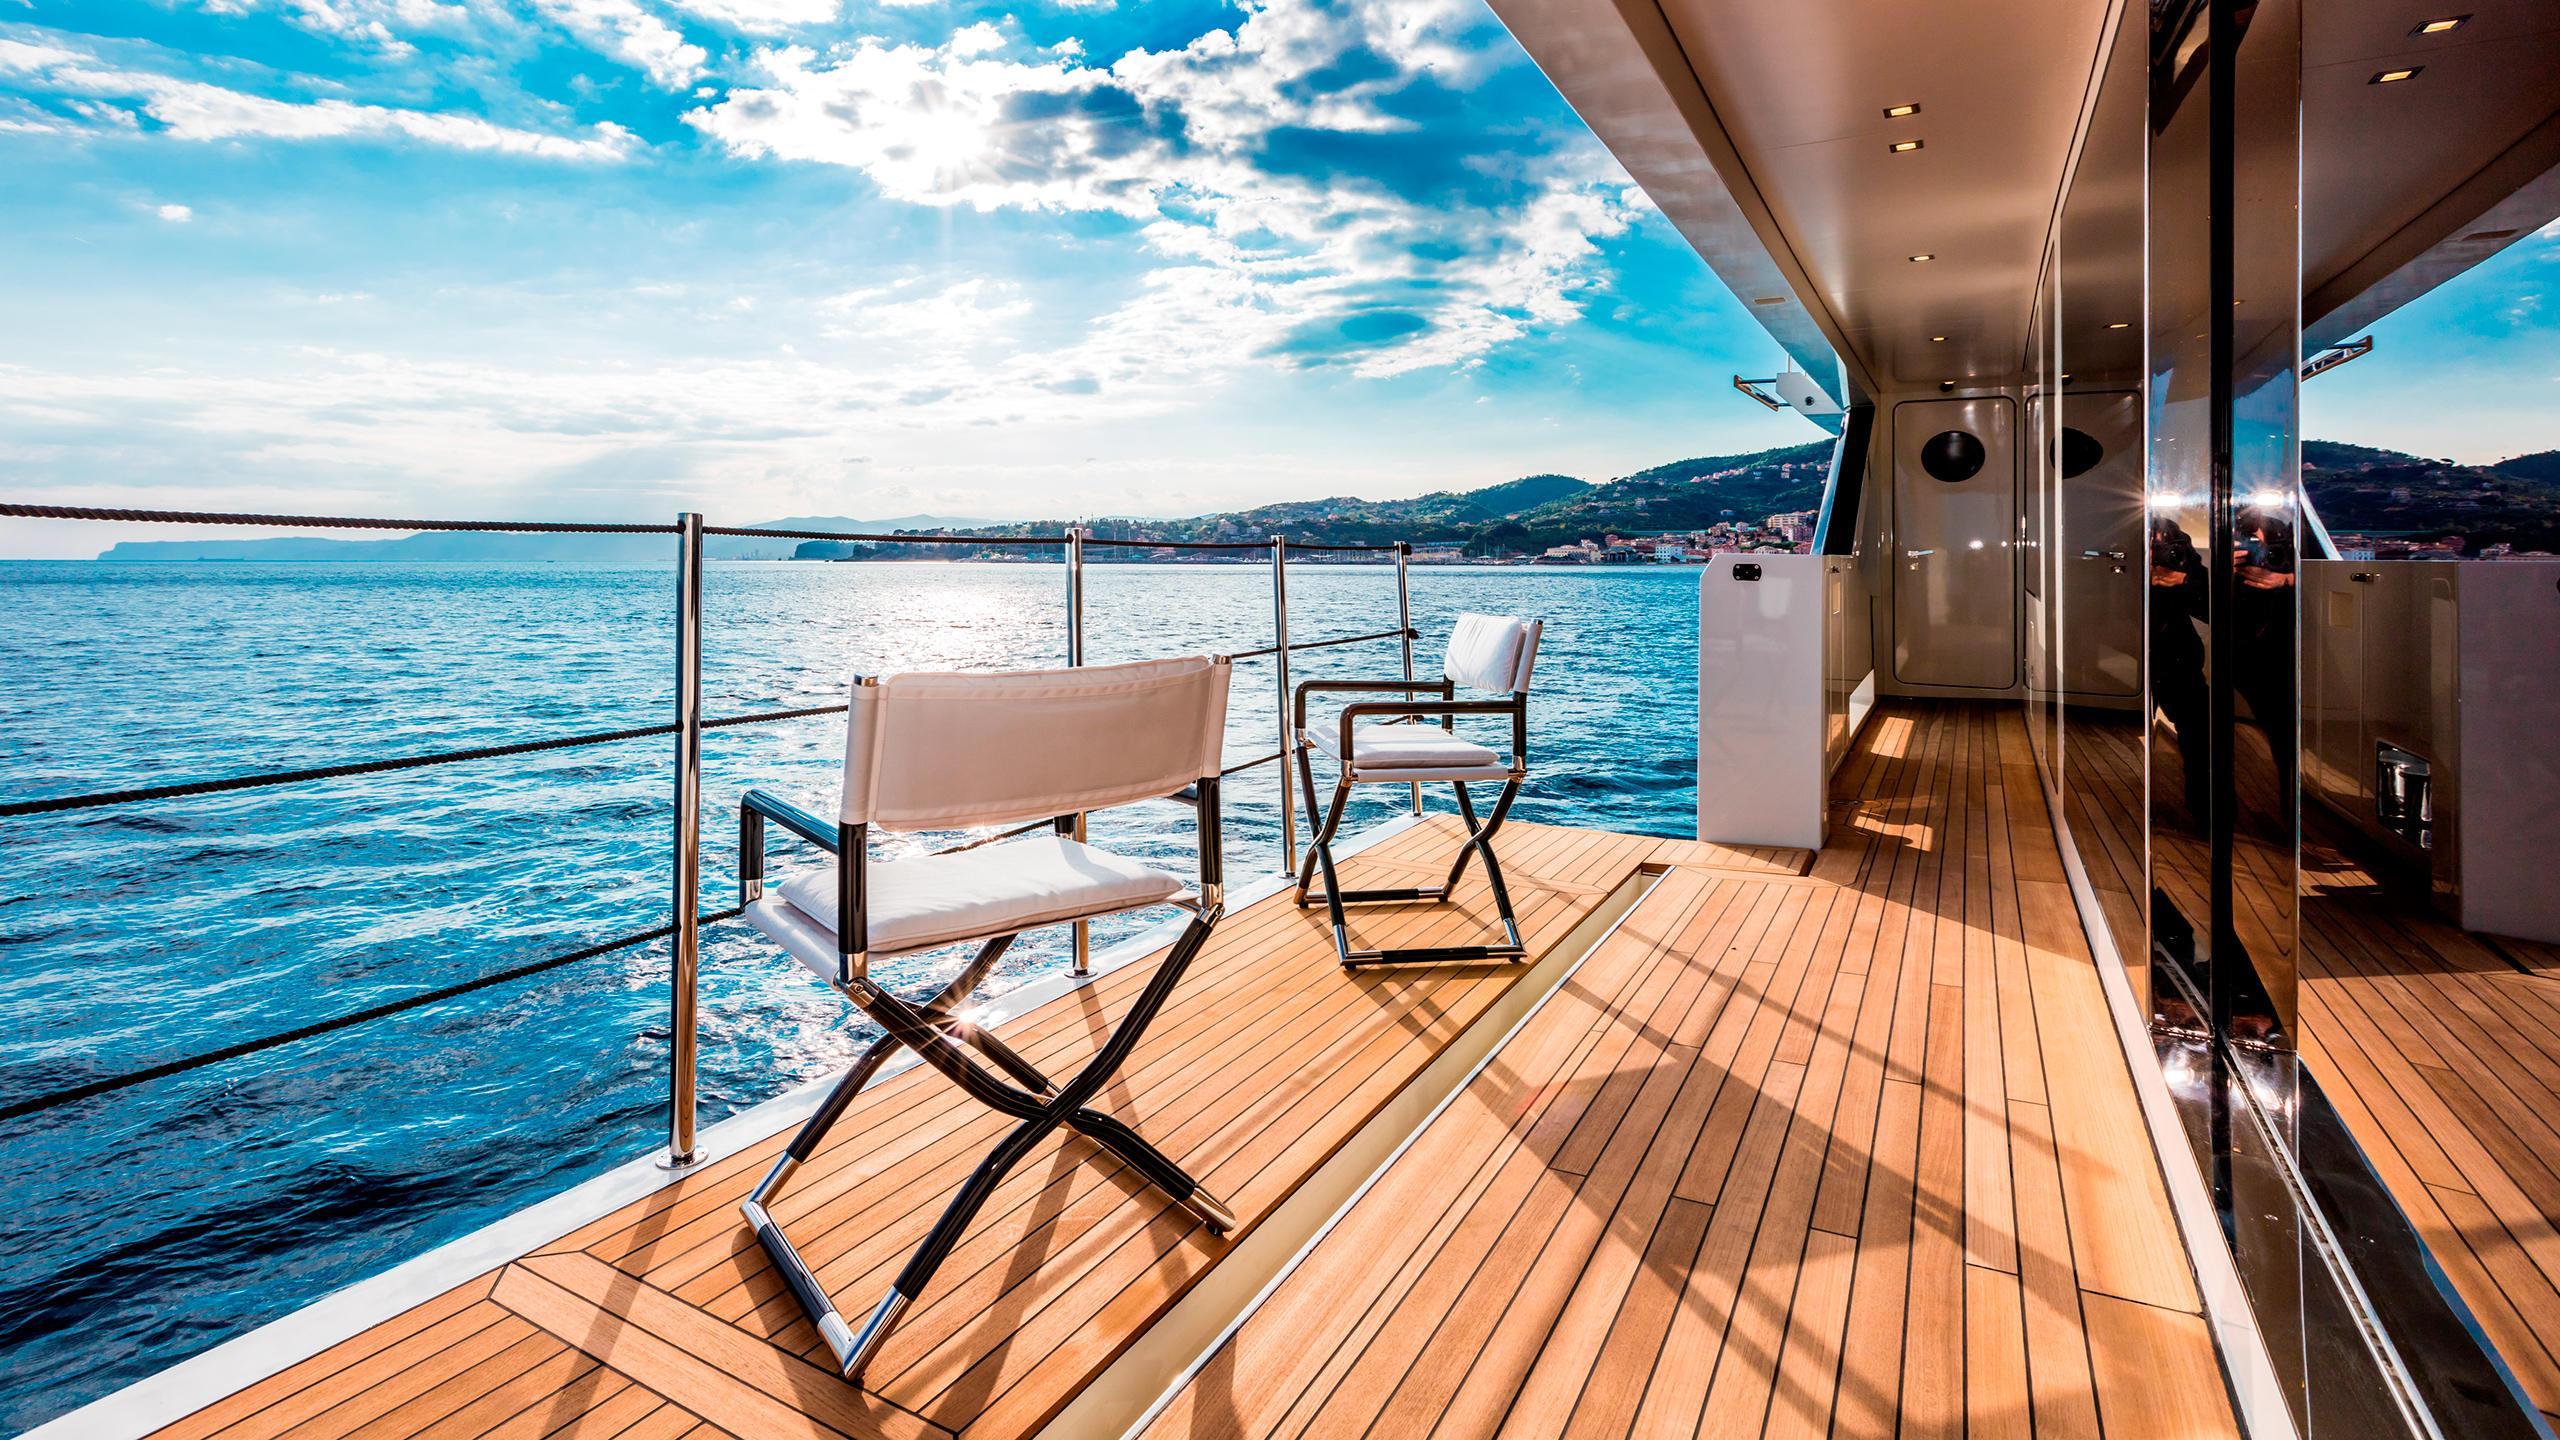 serenity-motor-yacht-mondomarine-2015-42m-balcony